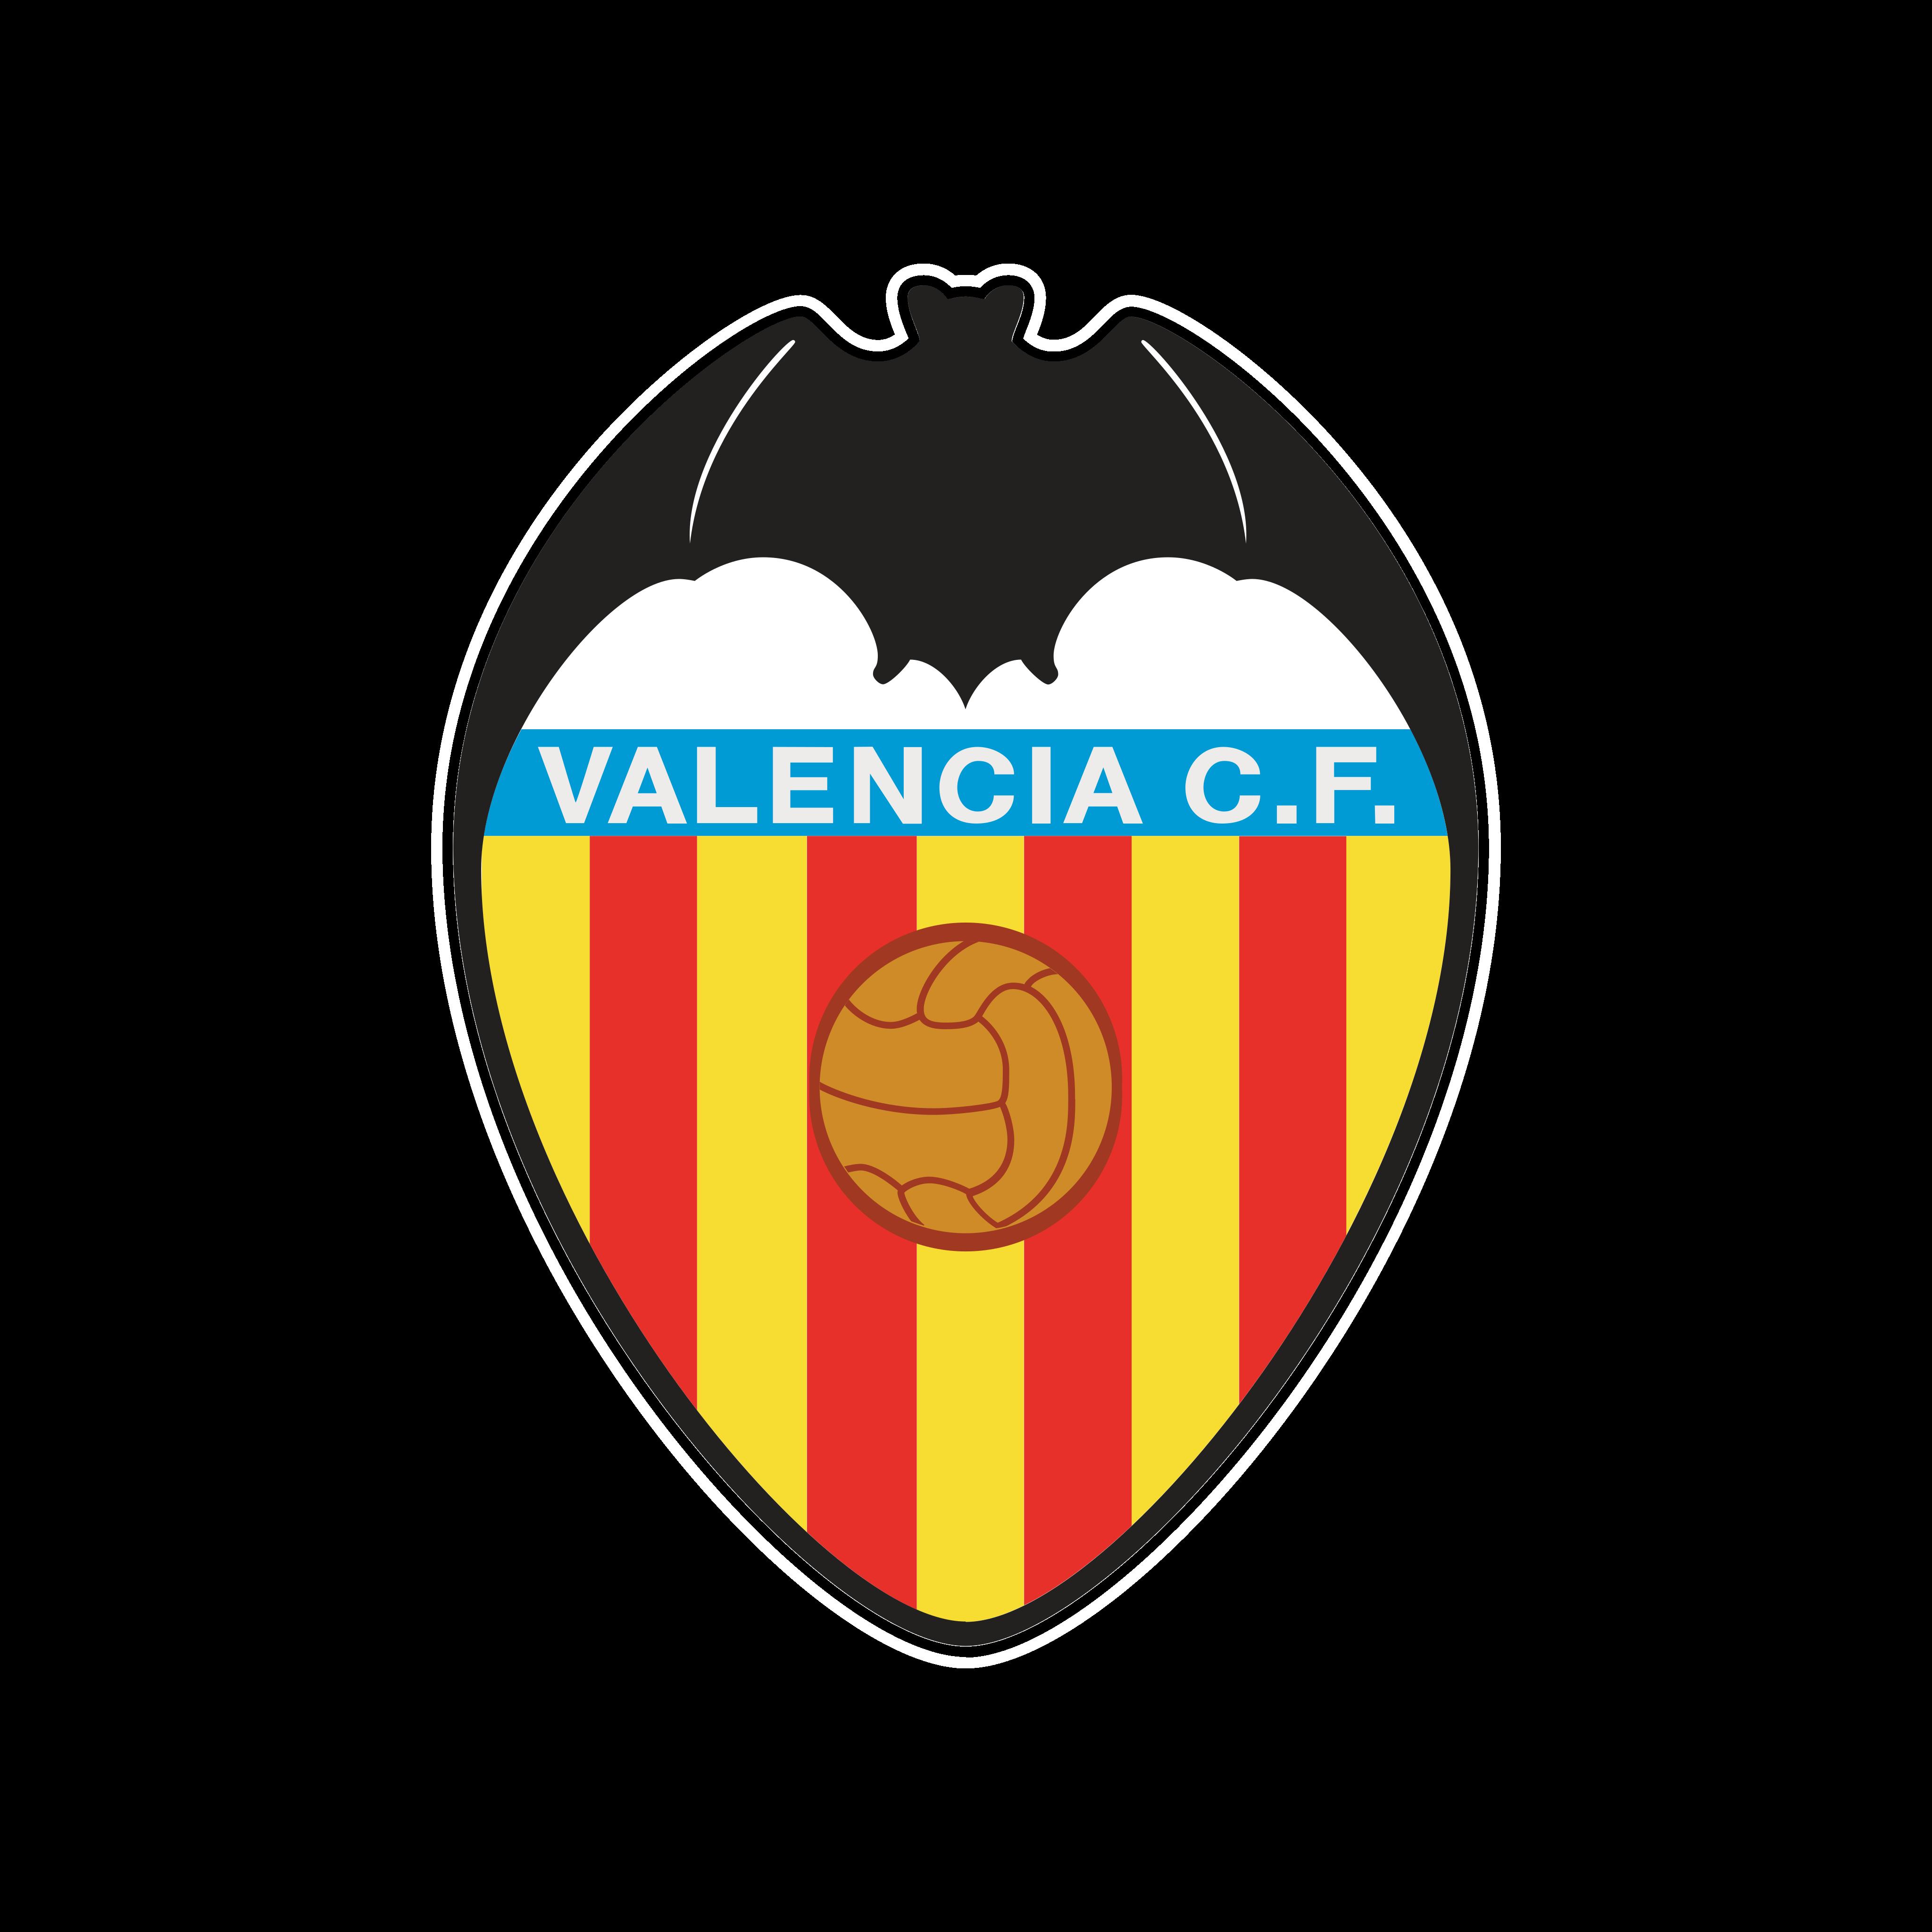 valencia cf logo escudo 0 - Valencia CF Logo – Escudo